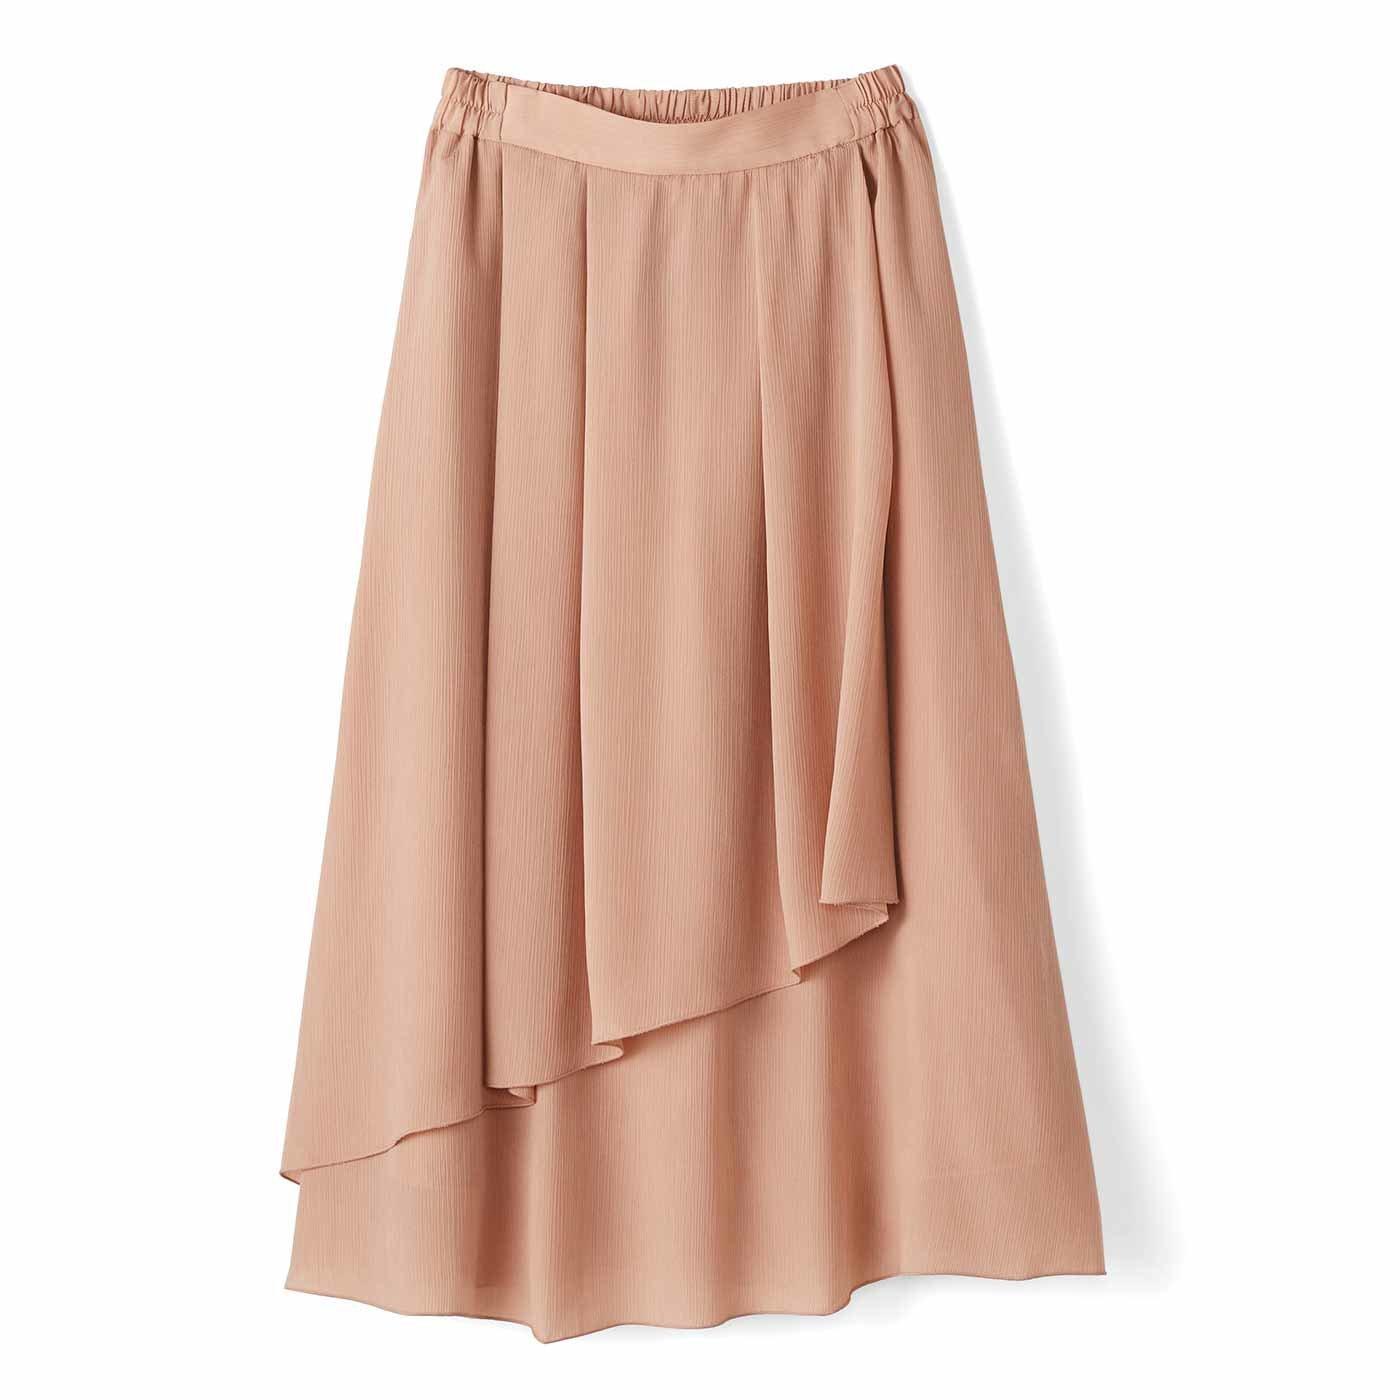 IEDIT[イディット] 動くたびゆらめく 花びらみたいなラップ風スカート〈ライトピンク〉